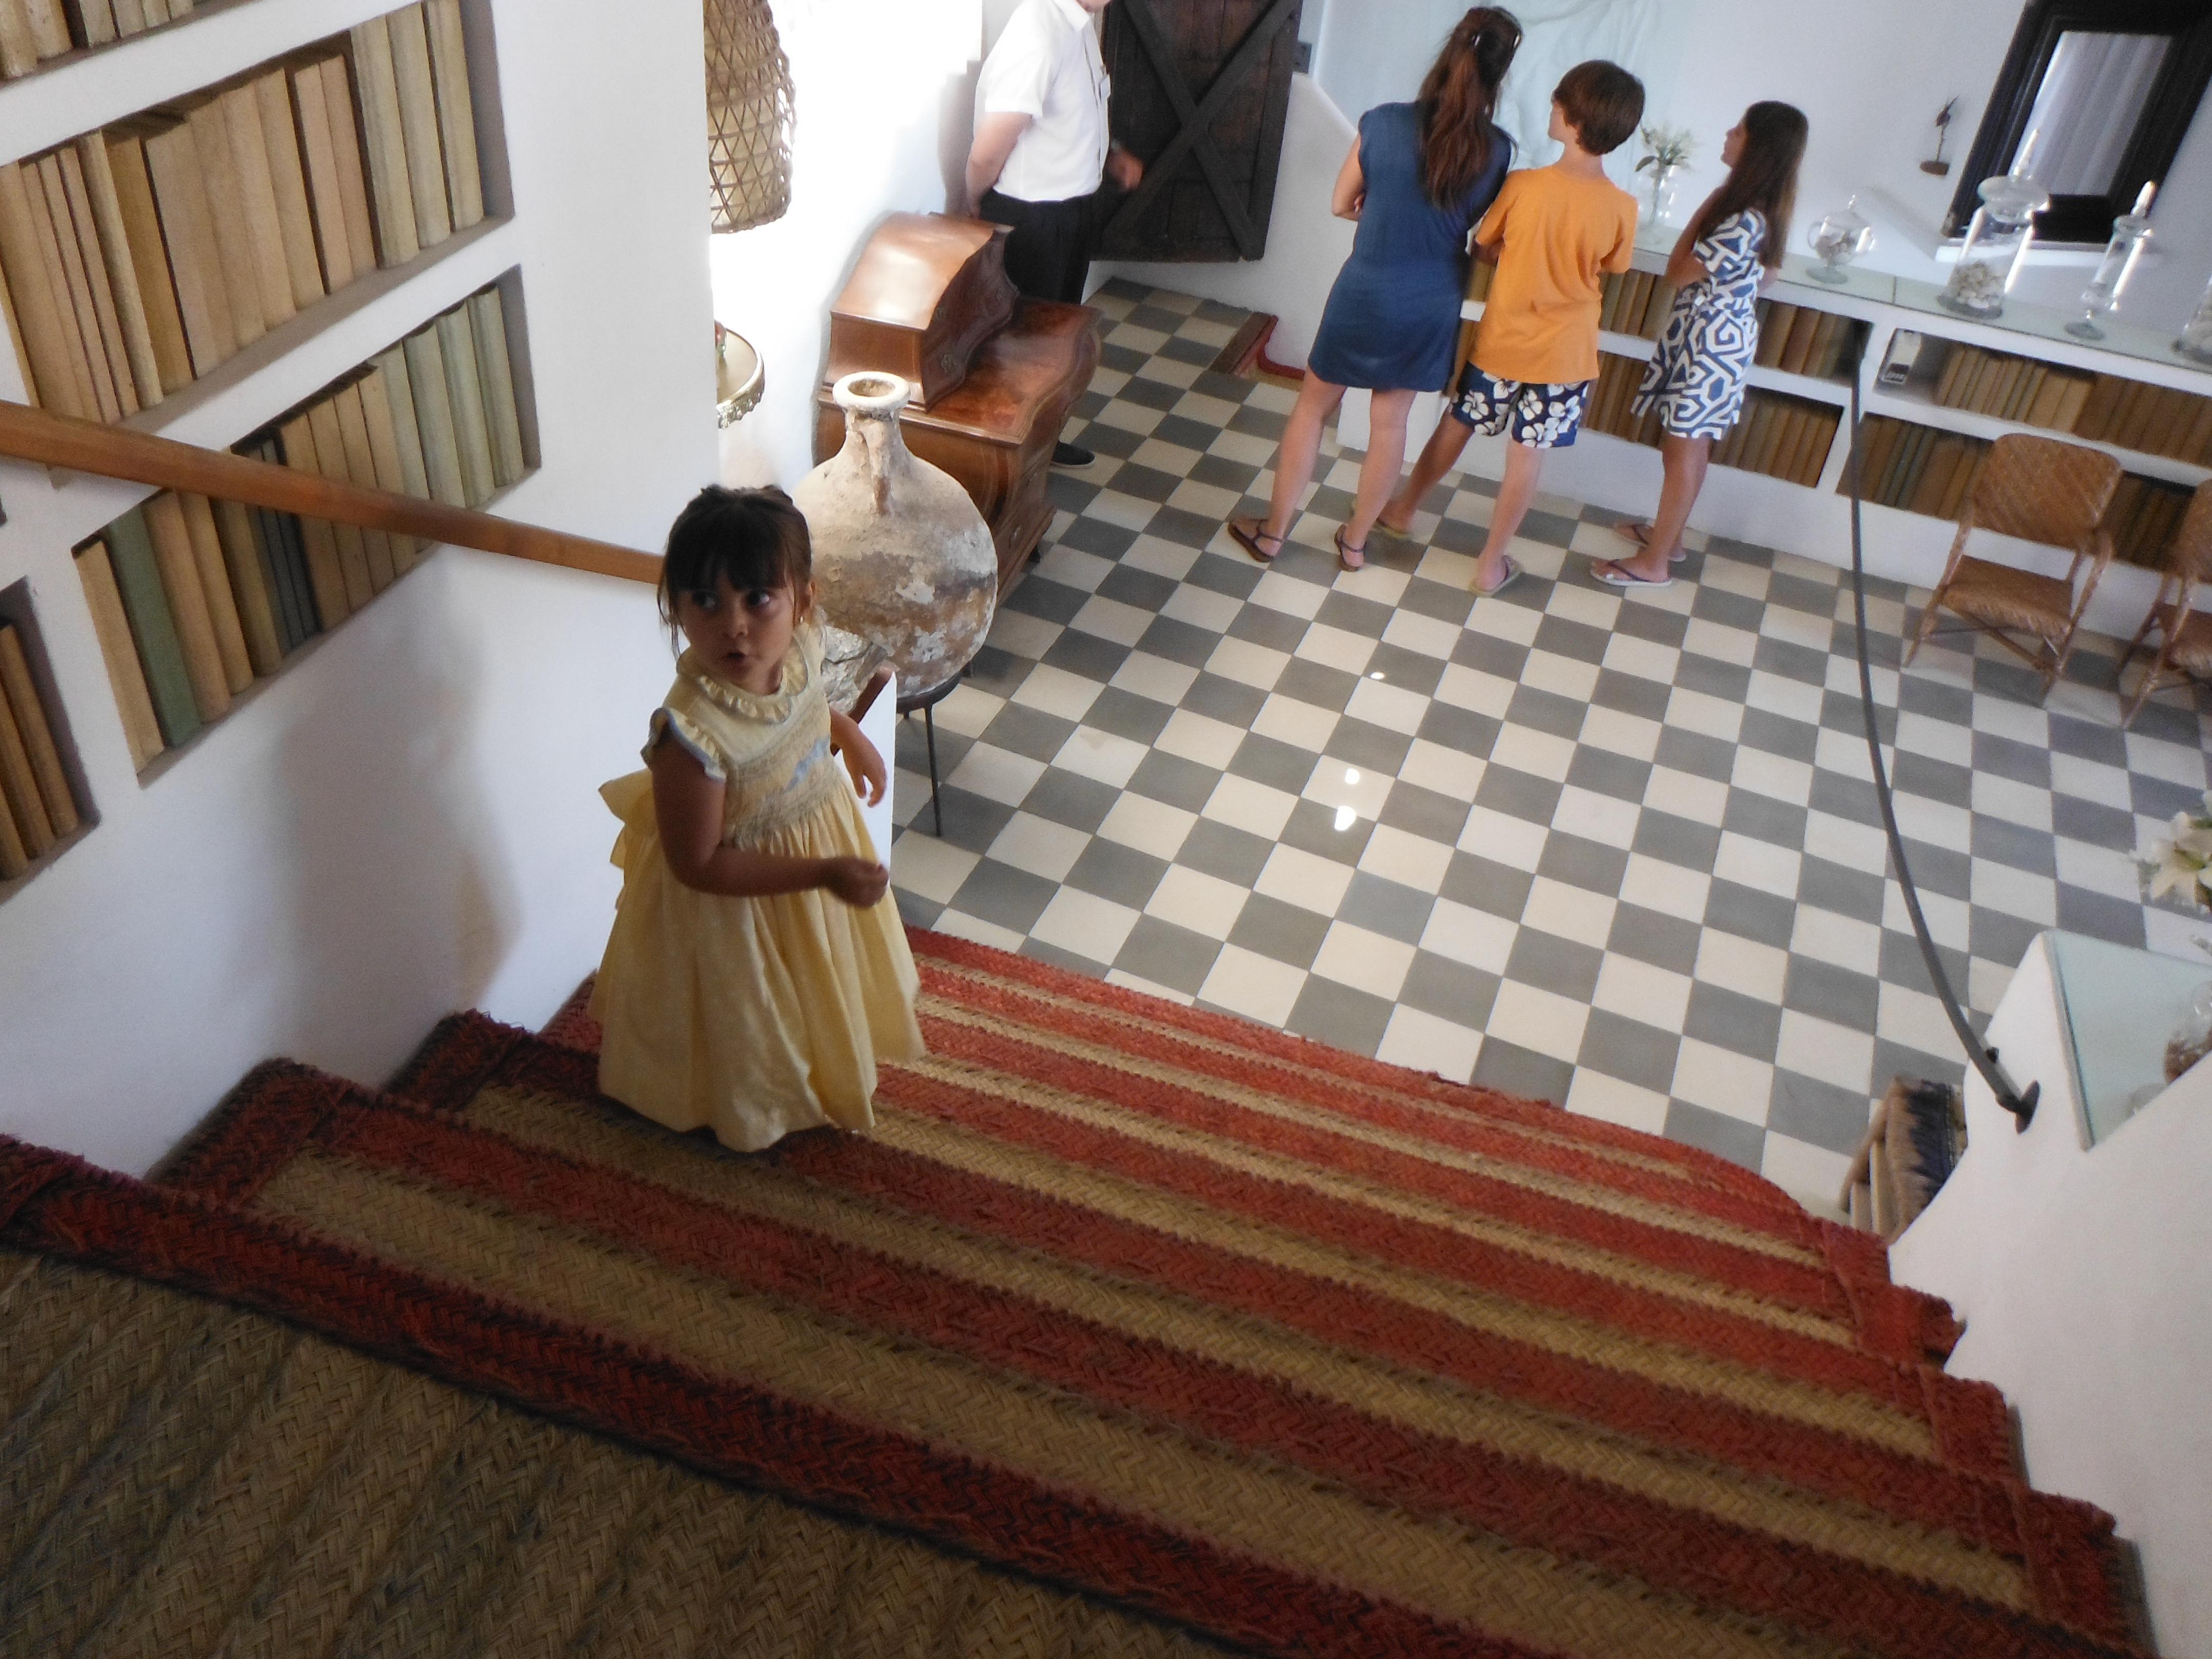 Laia Conociendo la Casa Museo Dalí en Port Lligat